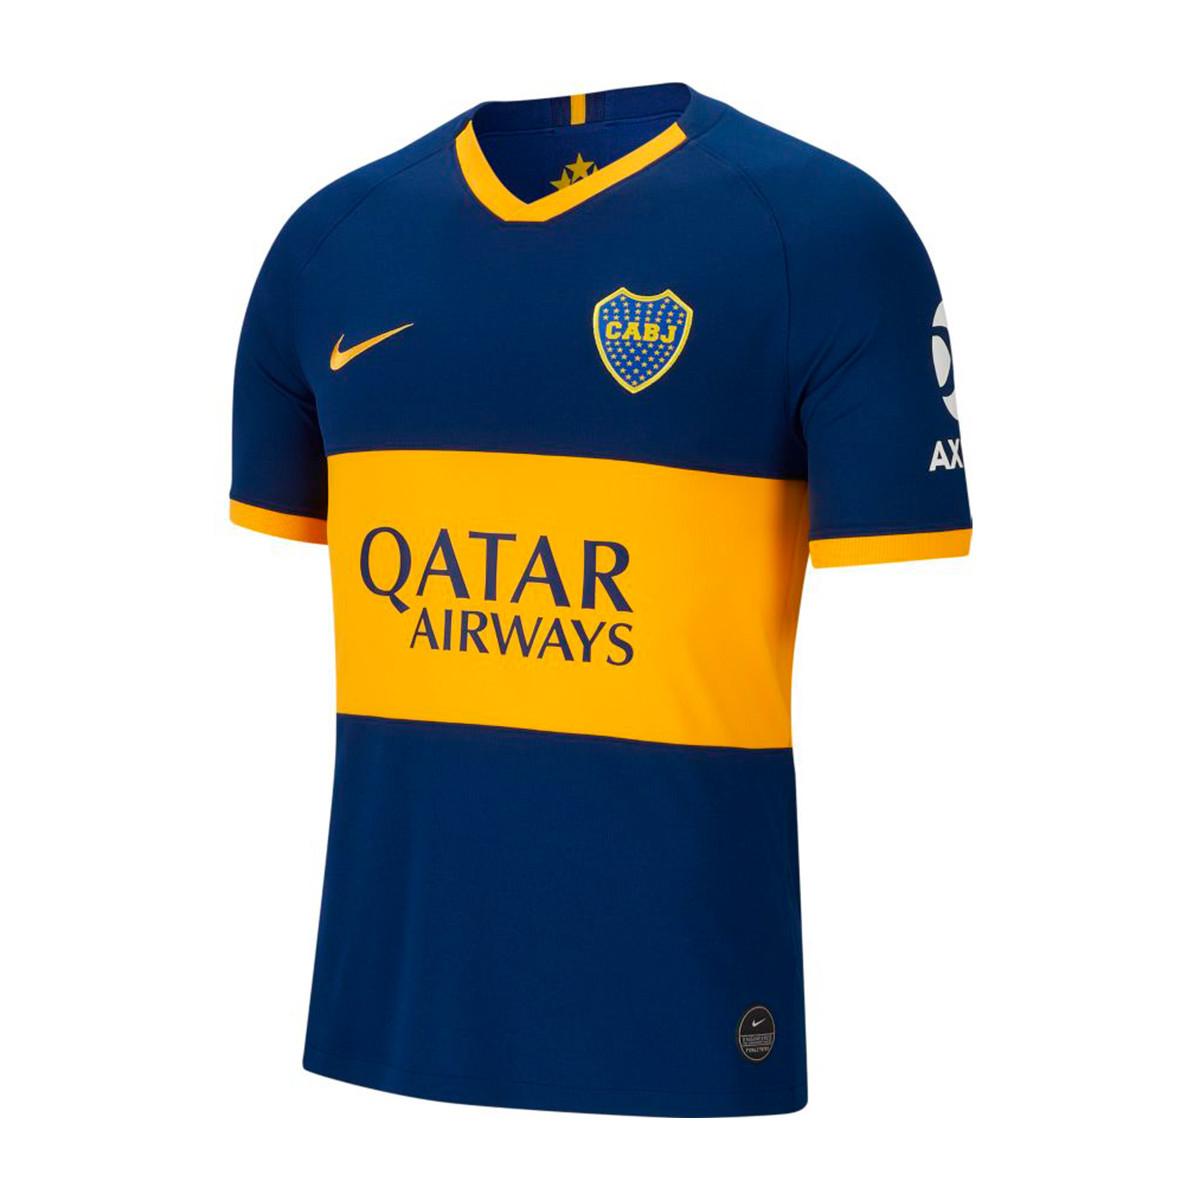 Irónico Por favor mira impaciente  Camiseta Nike Boca Juniors Breathe Stadium Primera Equipación 2019-2020  Blue void-University gold - Tienda de fútbol Fútbol Emotion